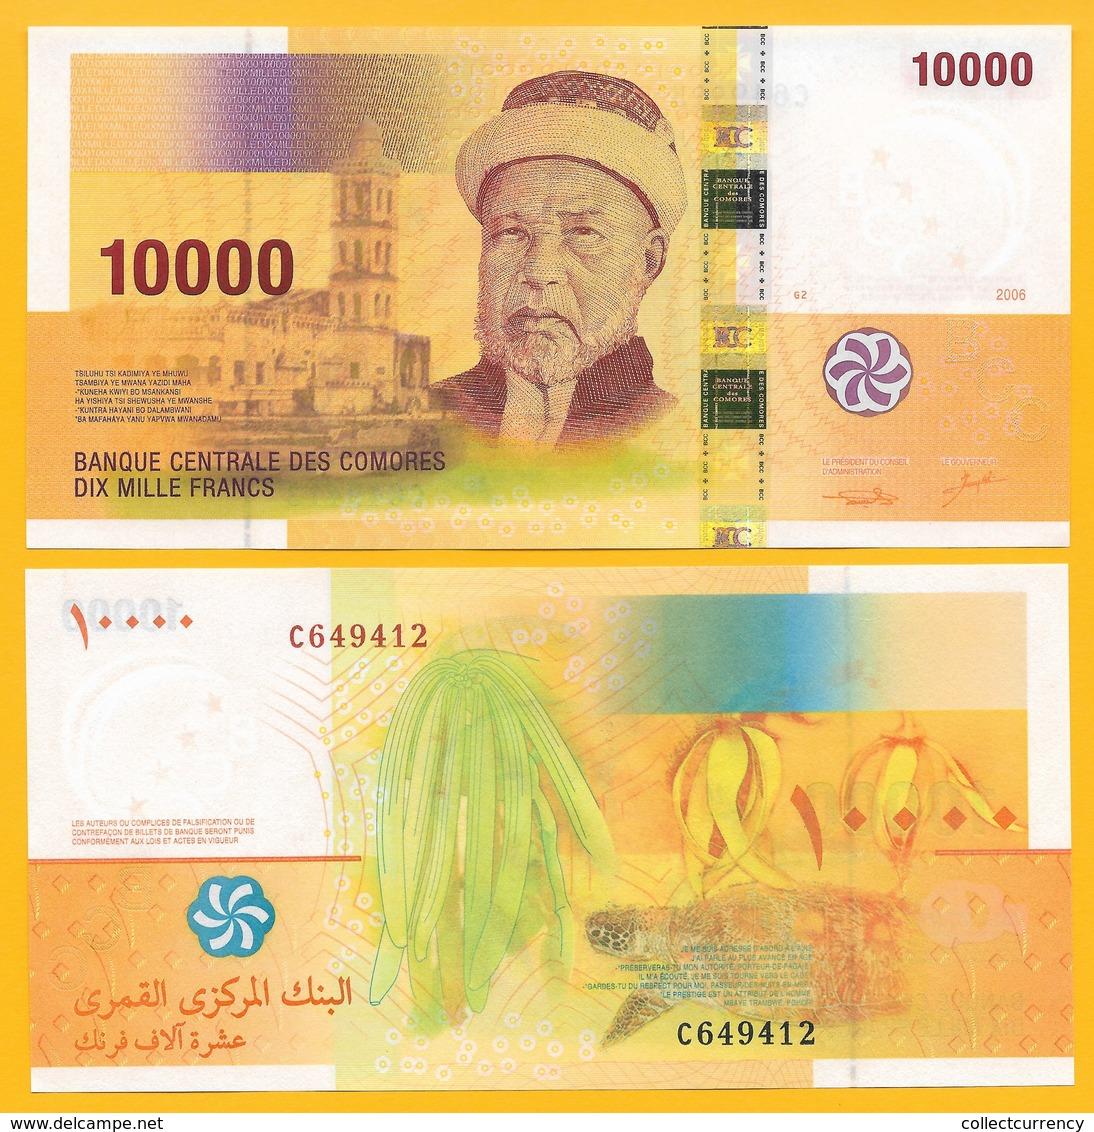 Comoros 10000 (10,000) Francs P-19a 2006 UNC - Comoren